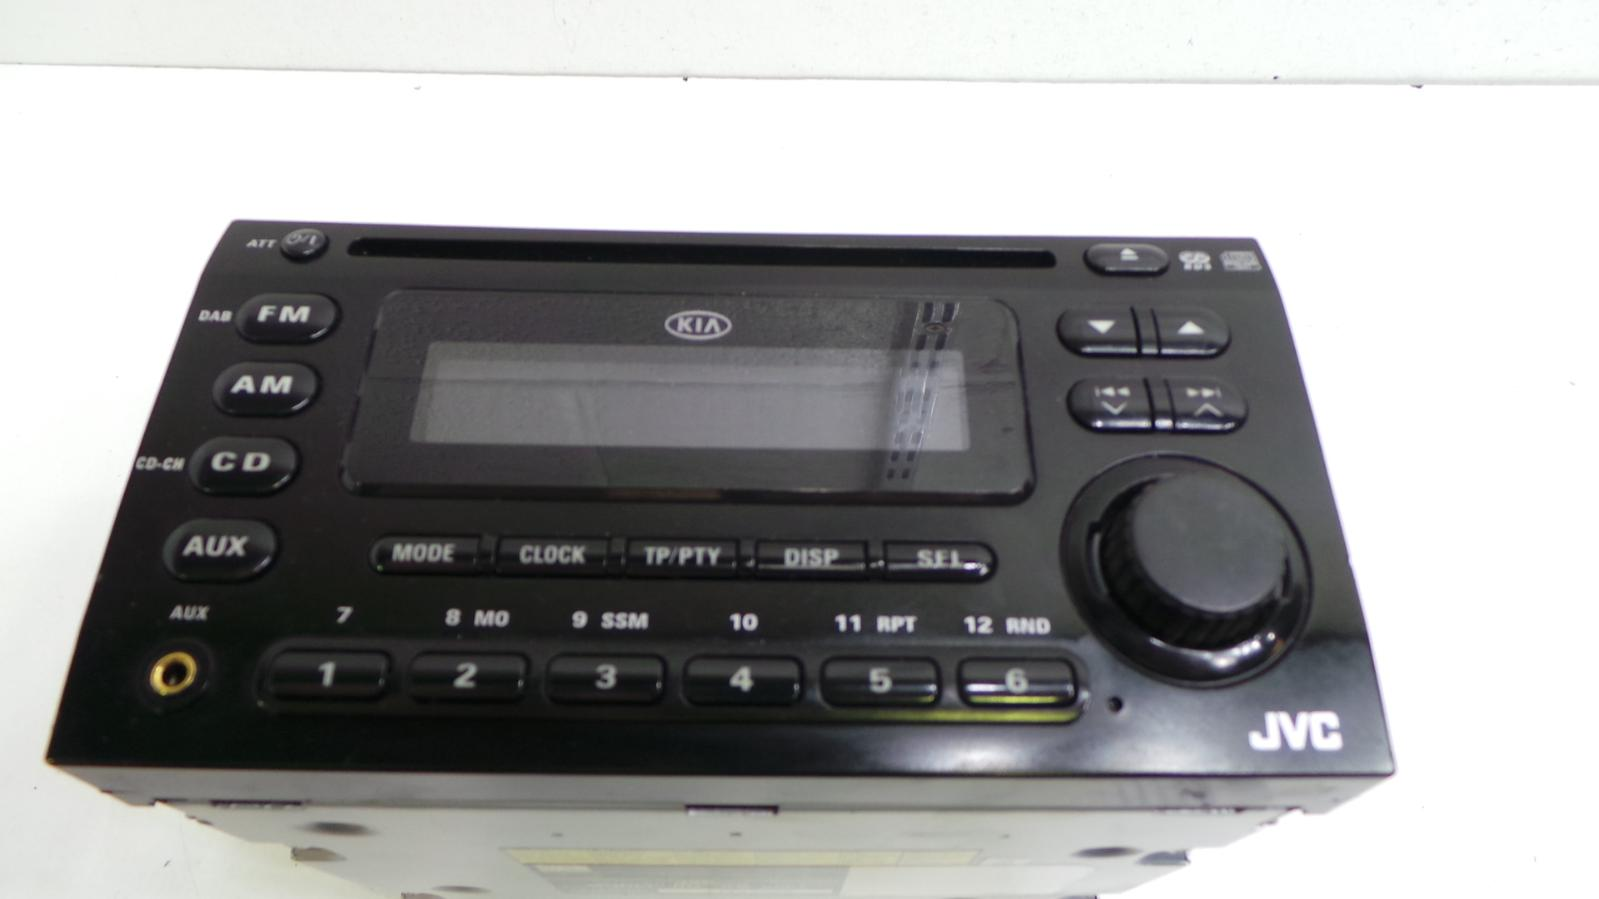 Skoda Octavia 2003 Wiring Diagram Skoda Car Radio Stereo Audio